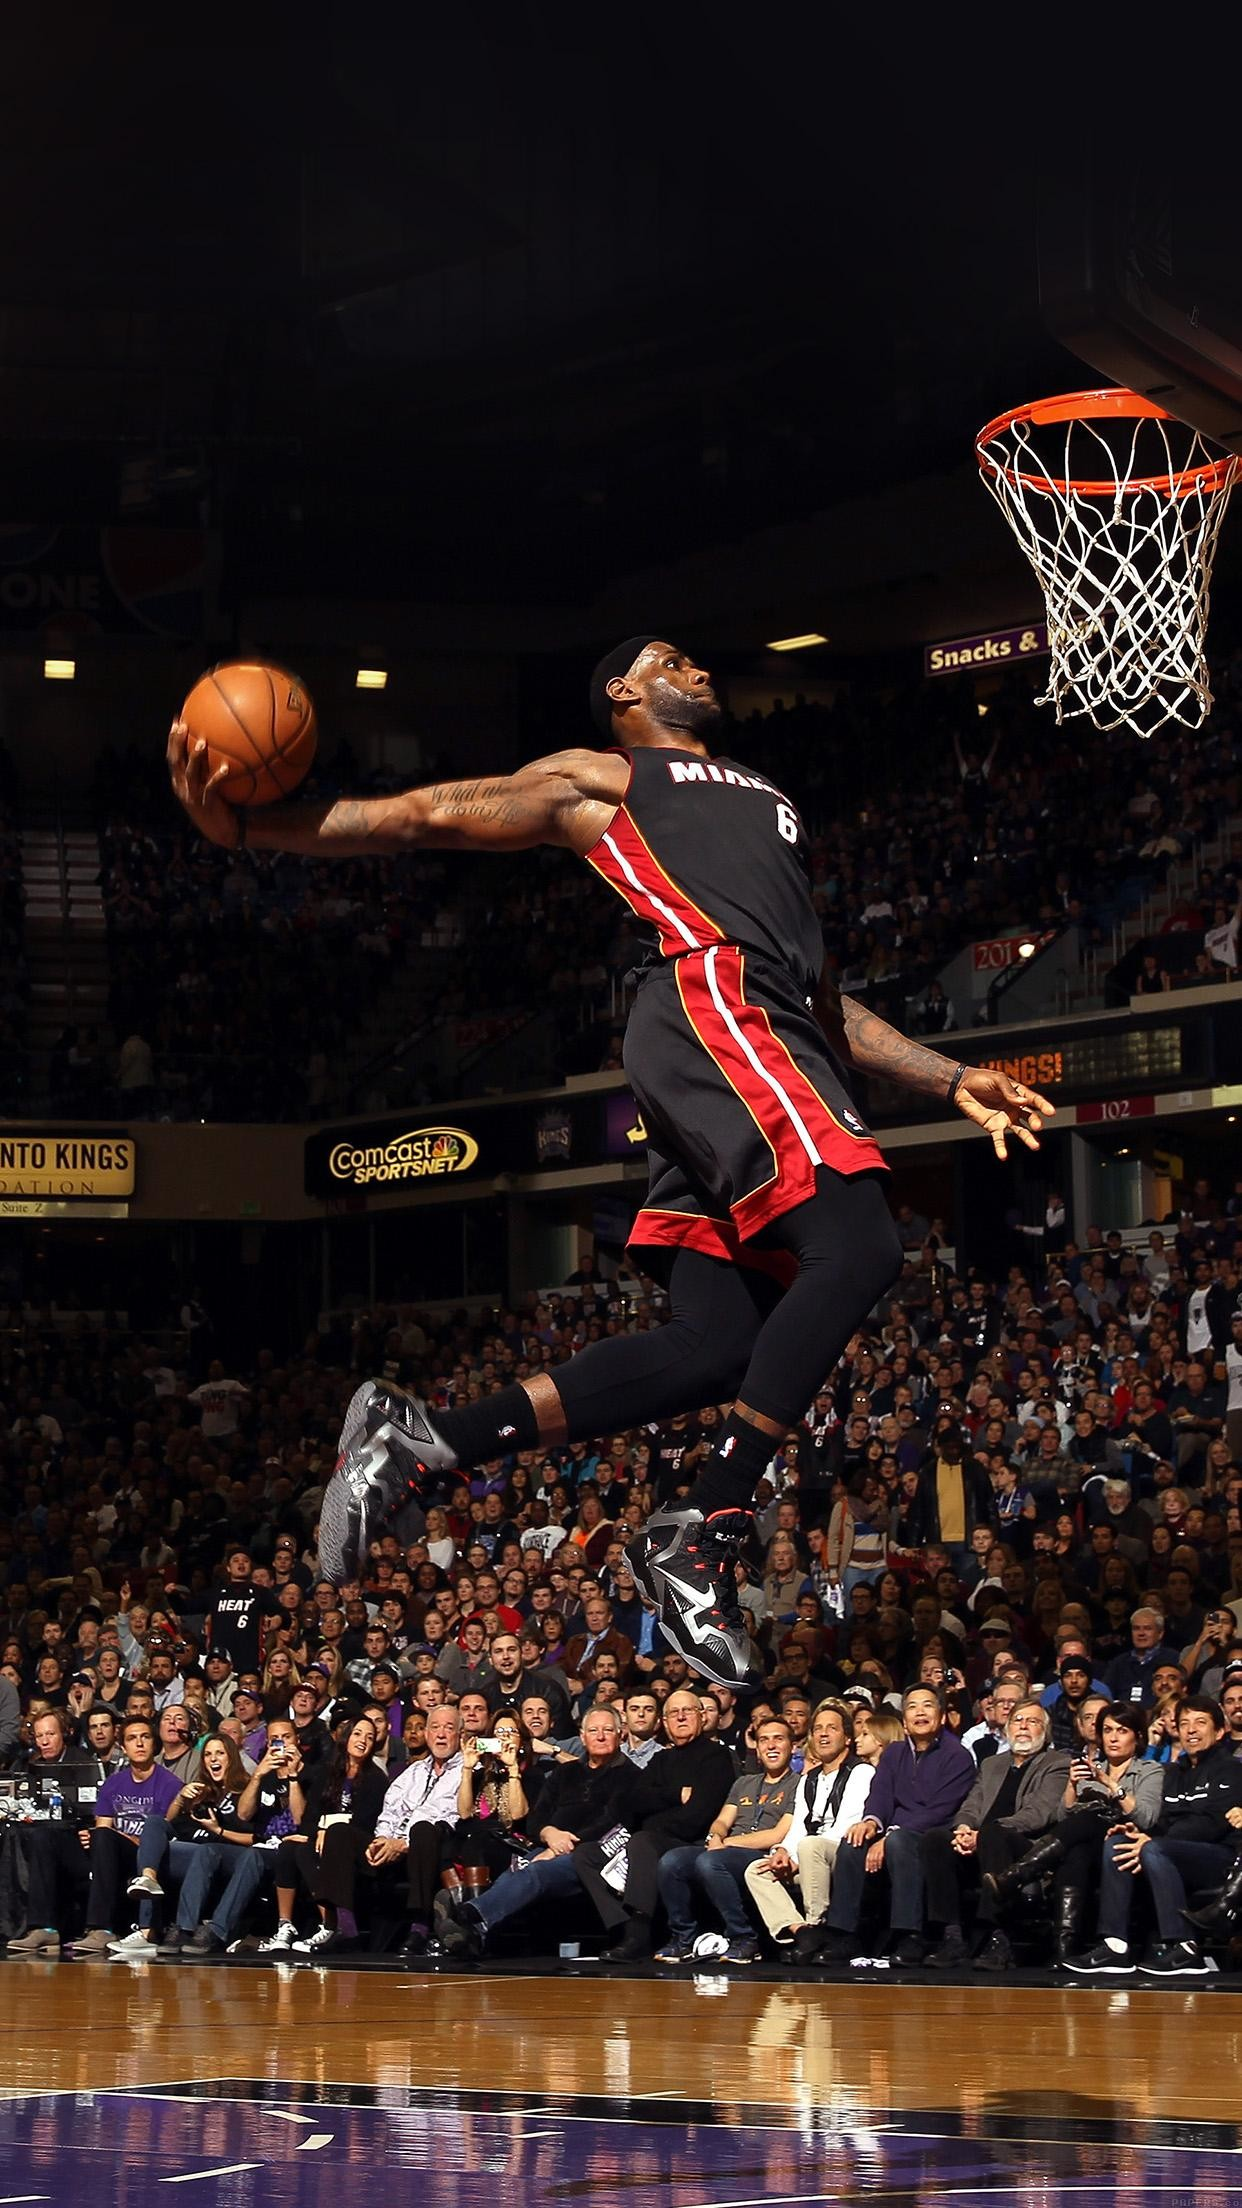 Lebron James Dunk Nba Sports Art Basketball